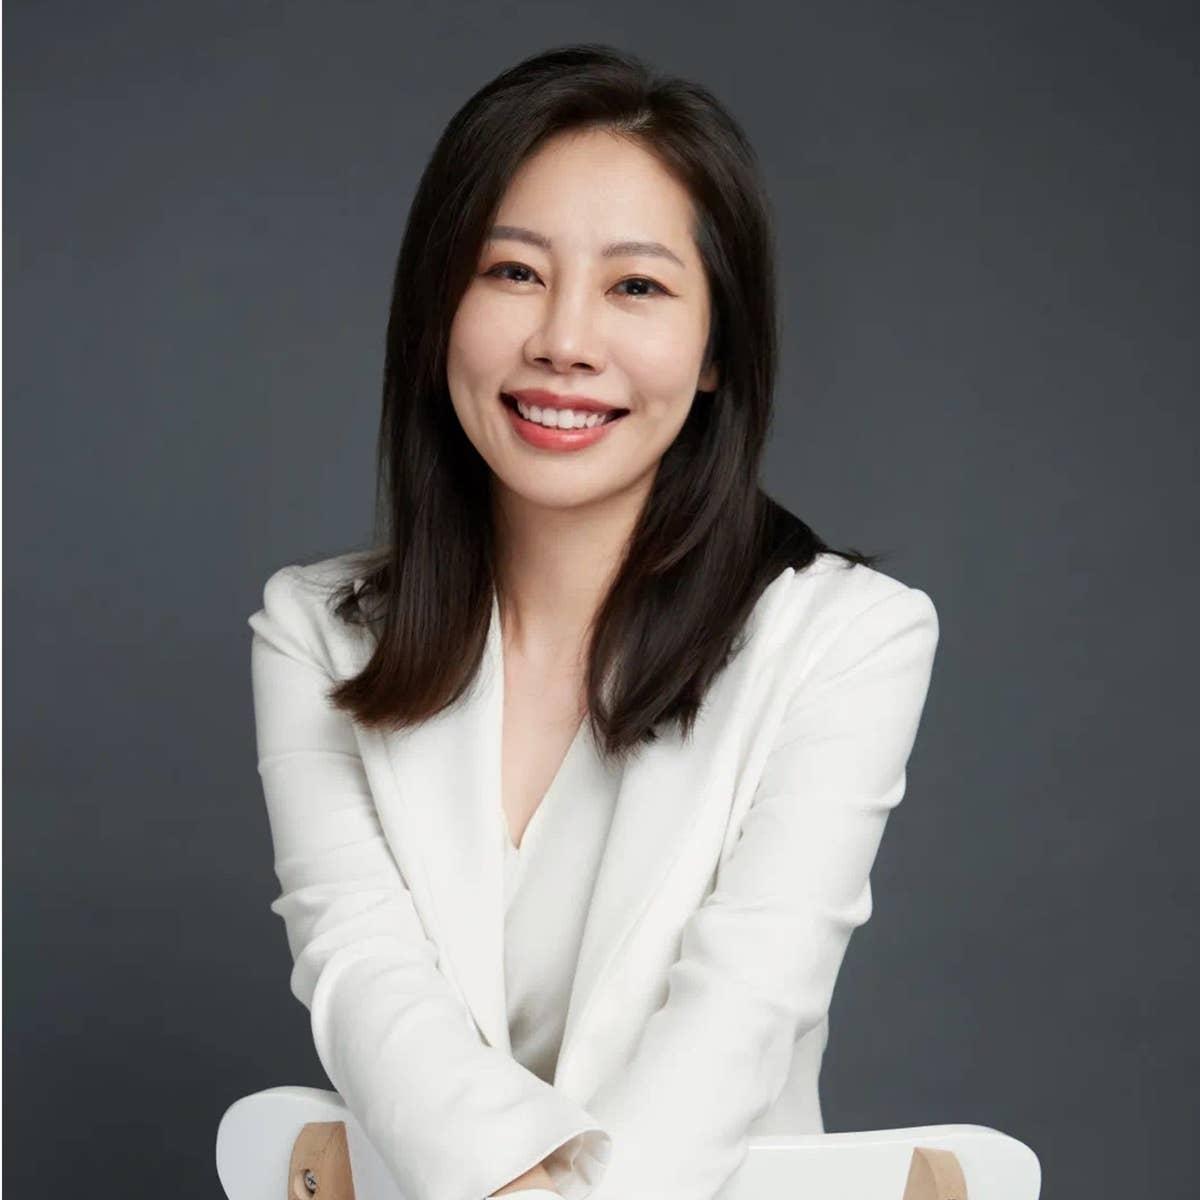 钱忆琳 Ami Qian